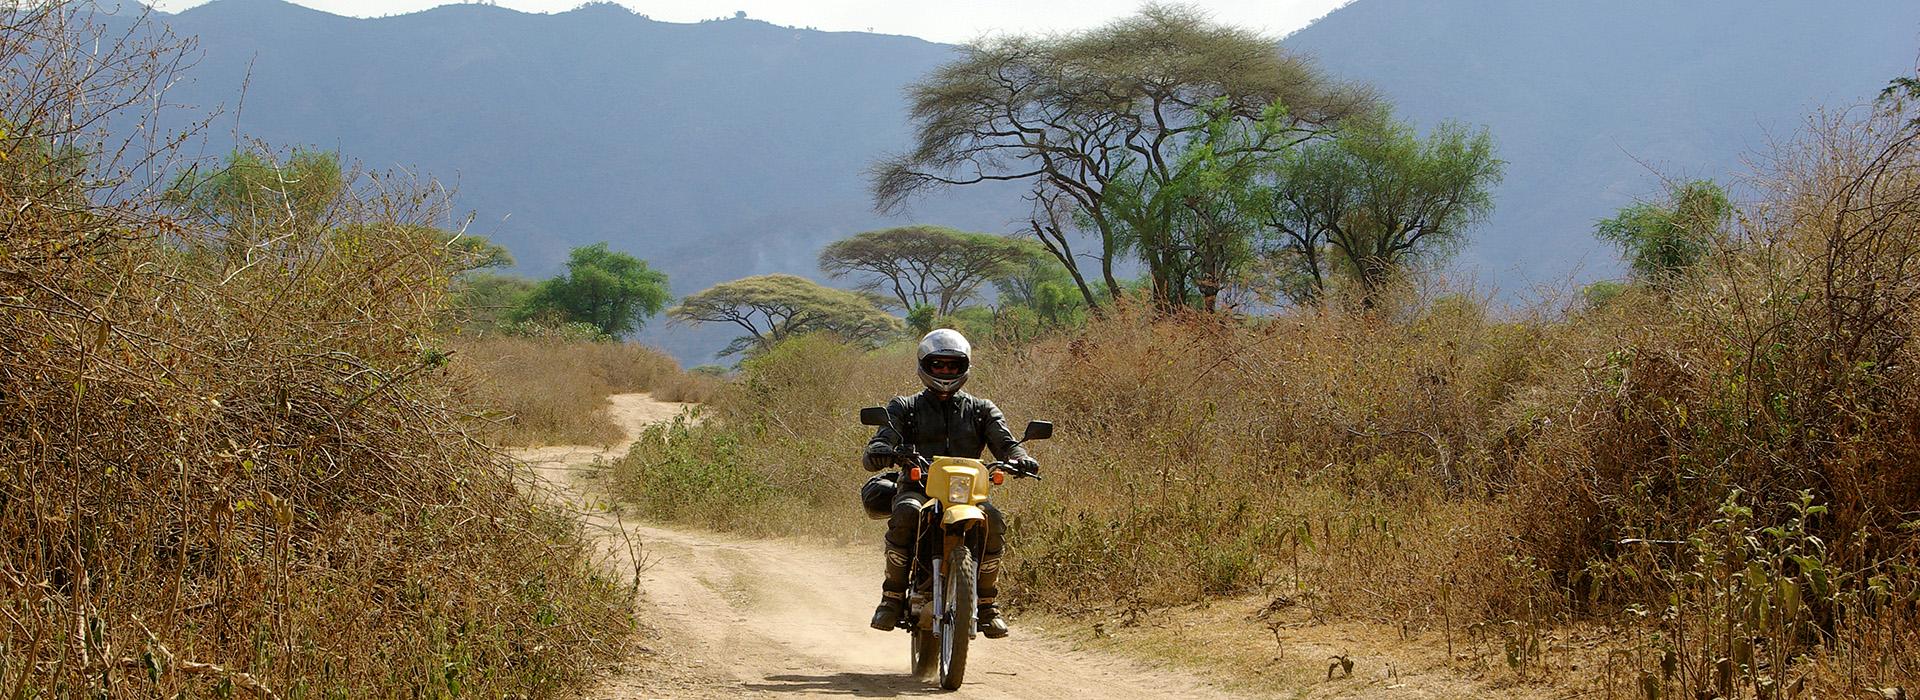 Motorreize Ethiopie de abesinnie motor challenge van Travel 2 Explore